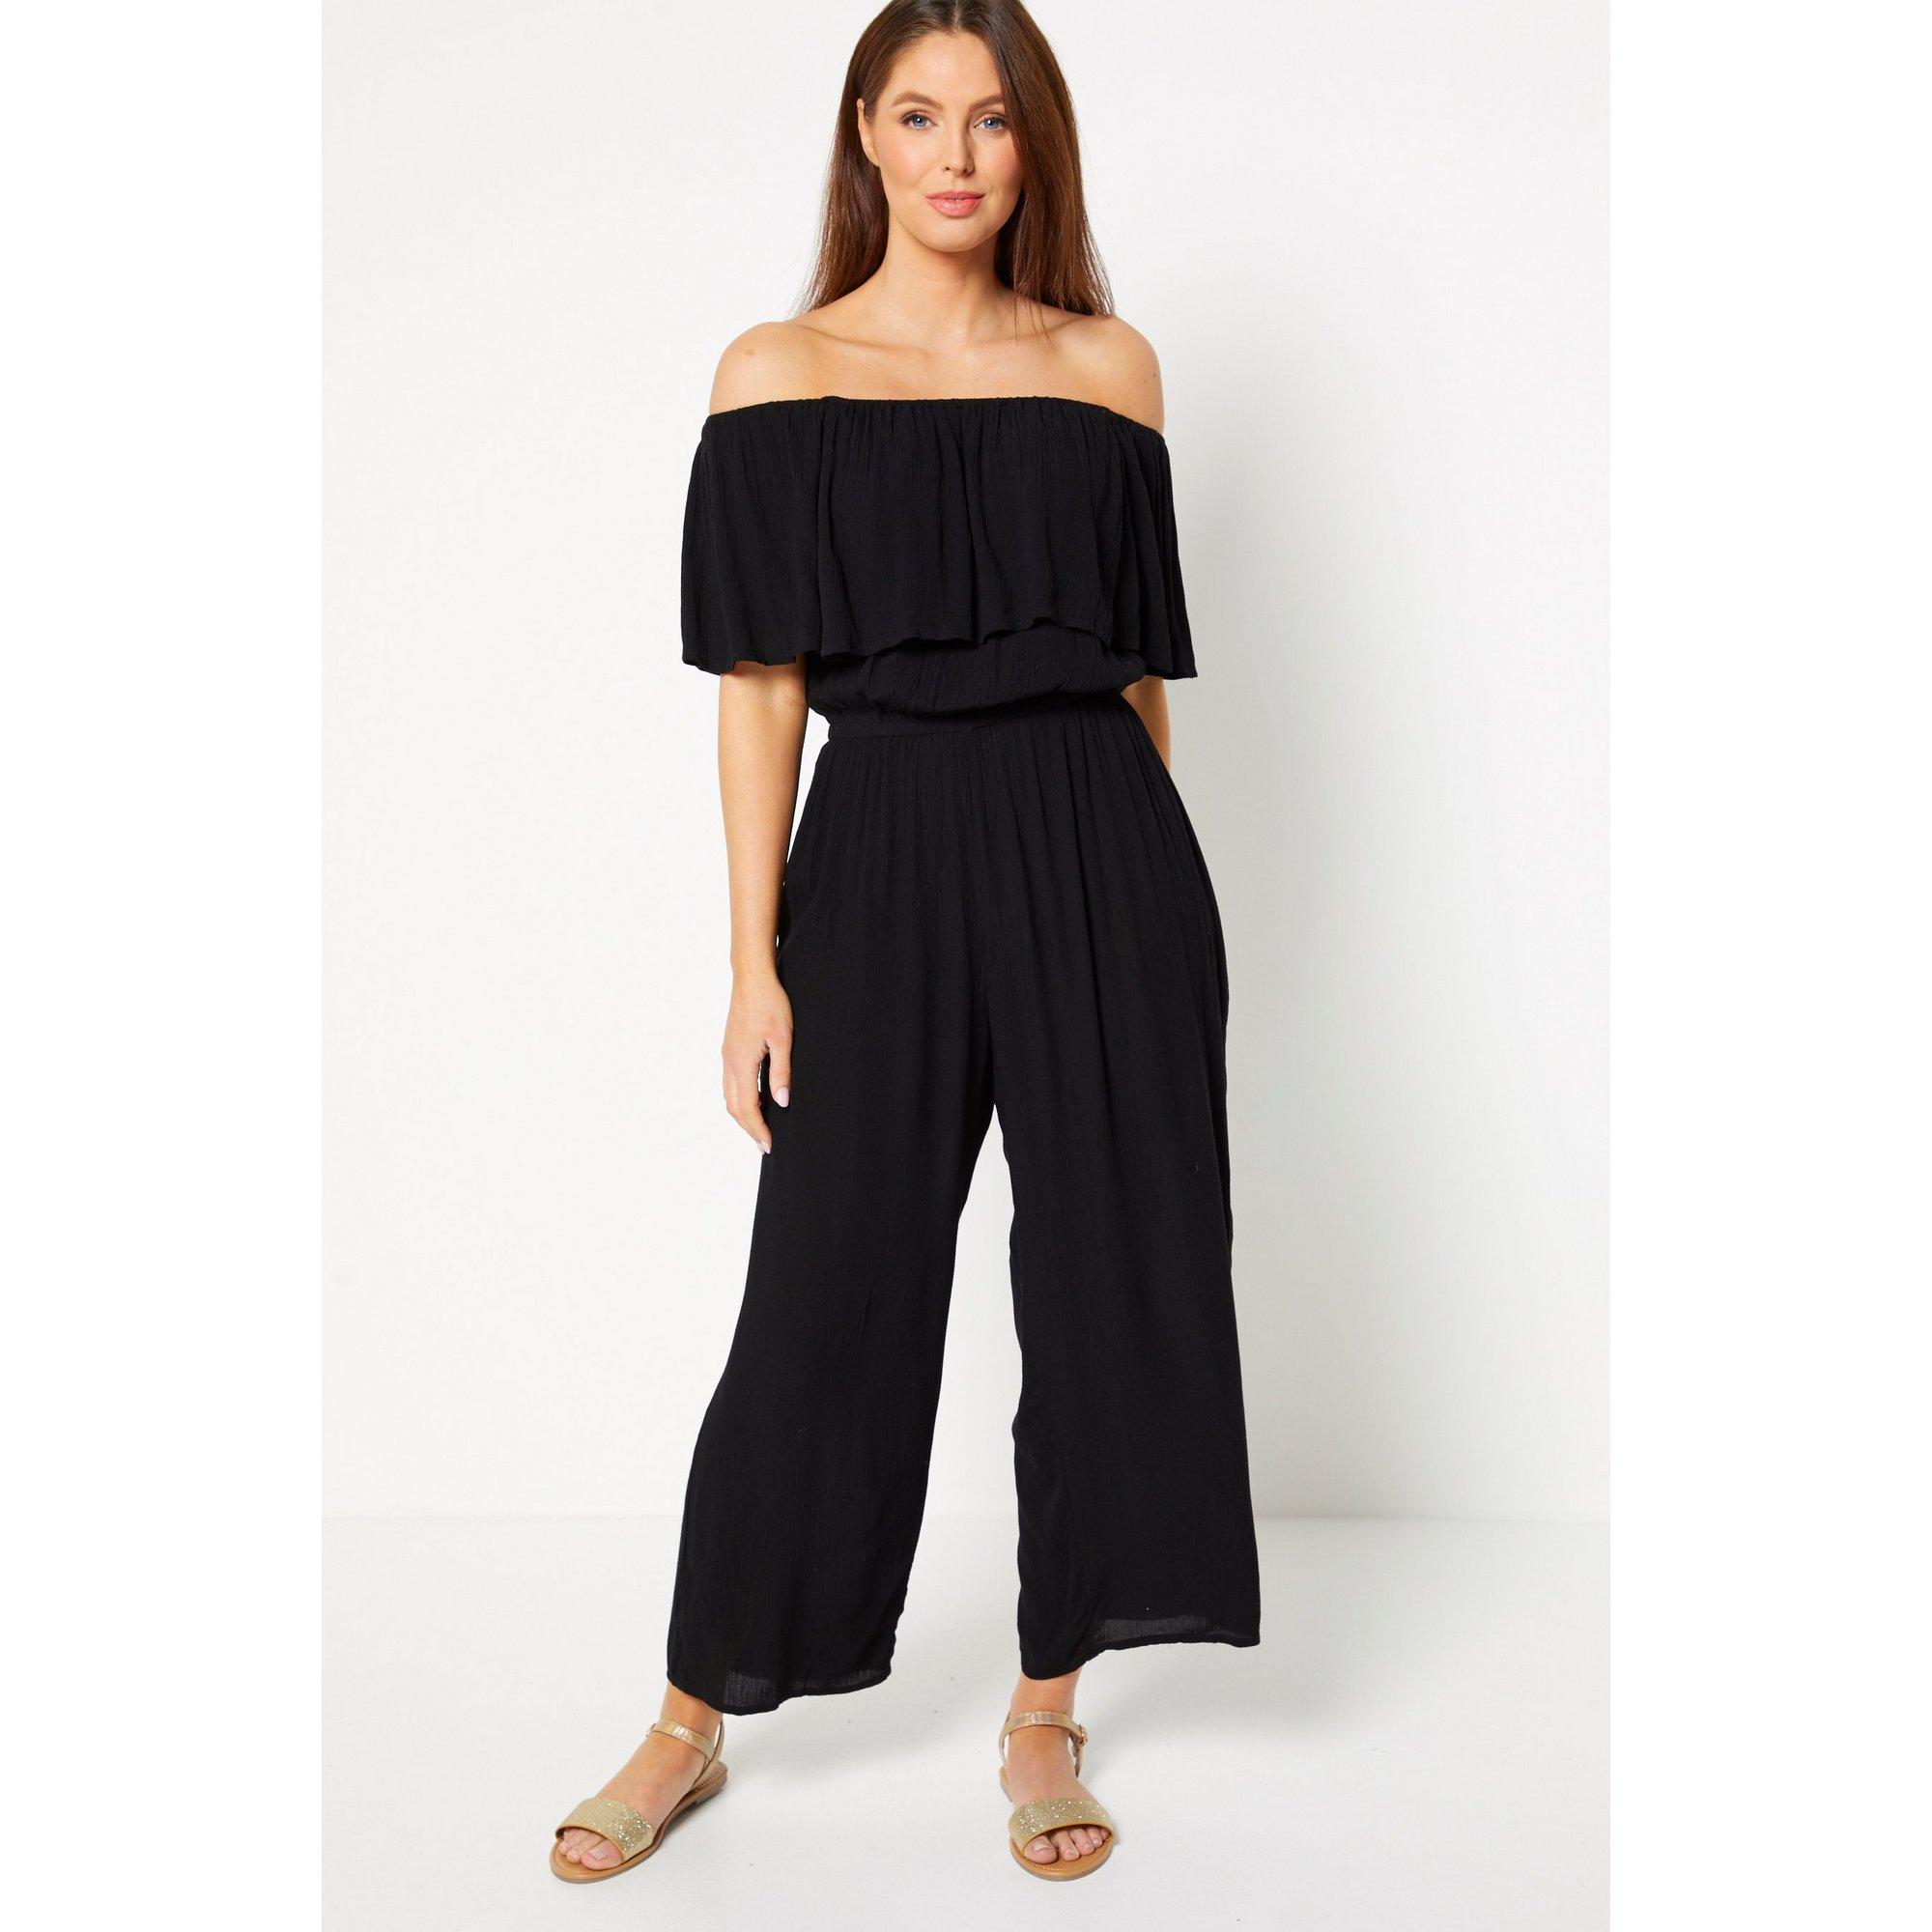 Image of Black Crinkle Bardot Cropped Jumpsuit